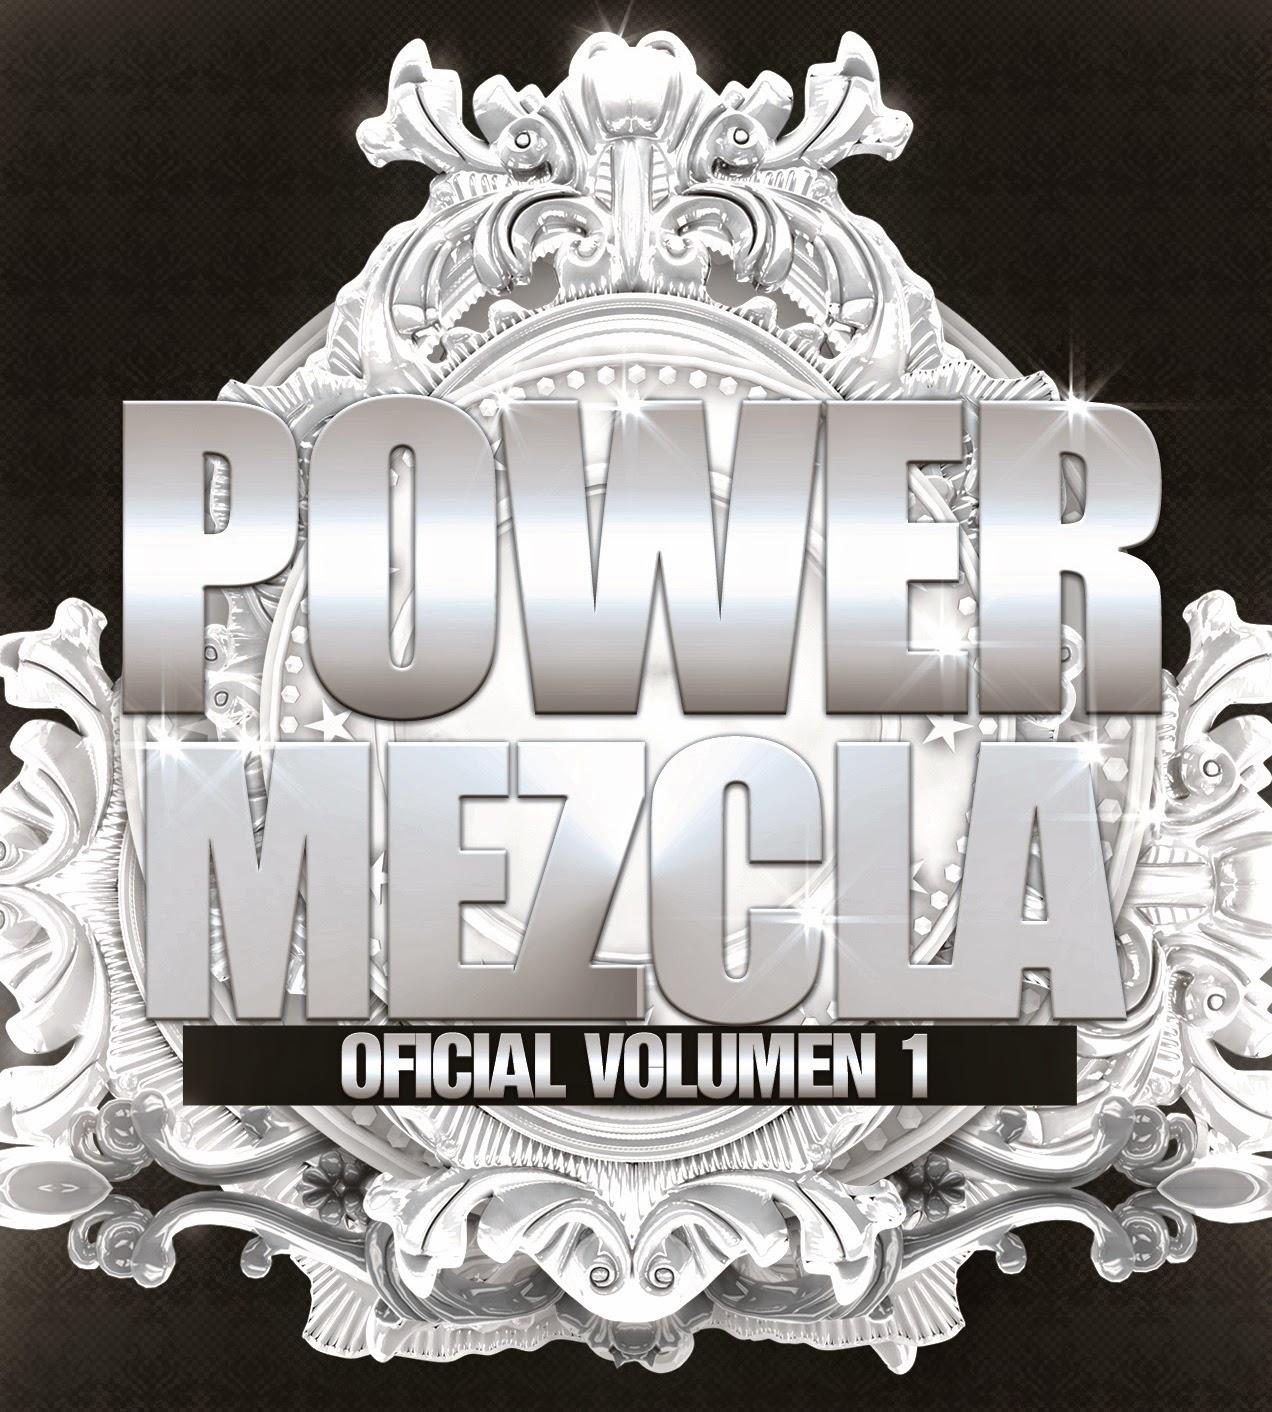 Power DeeJays - La Power Mezcla Numero Uno (2014)